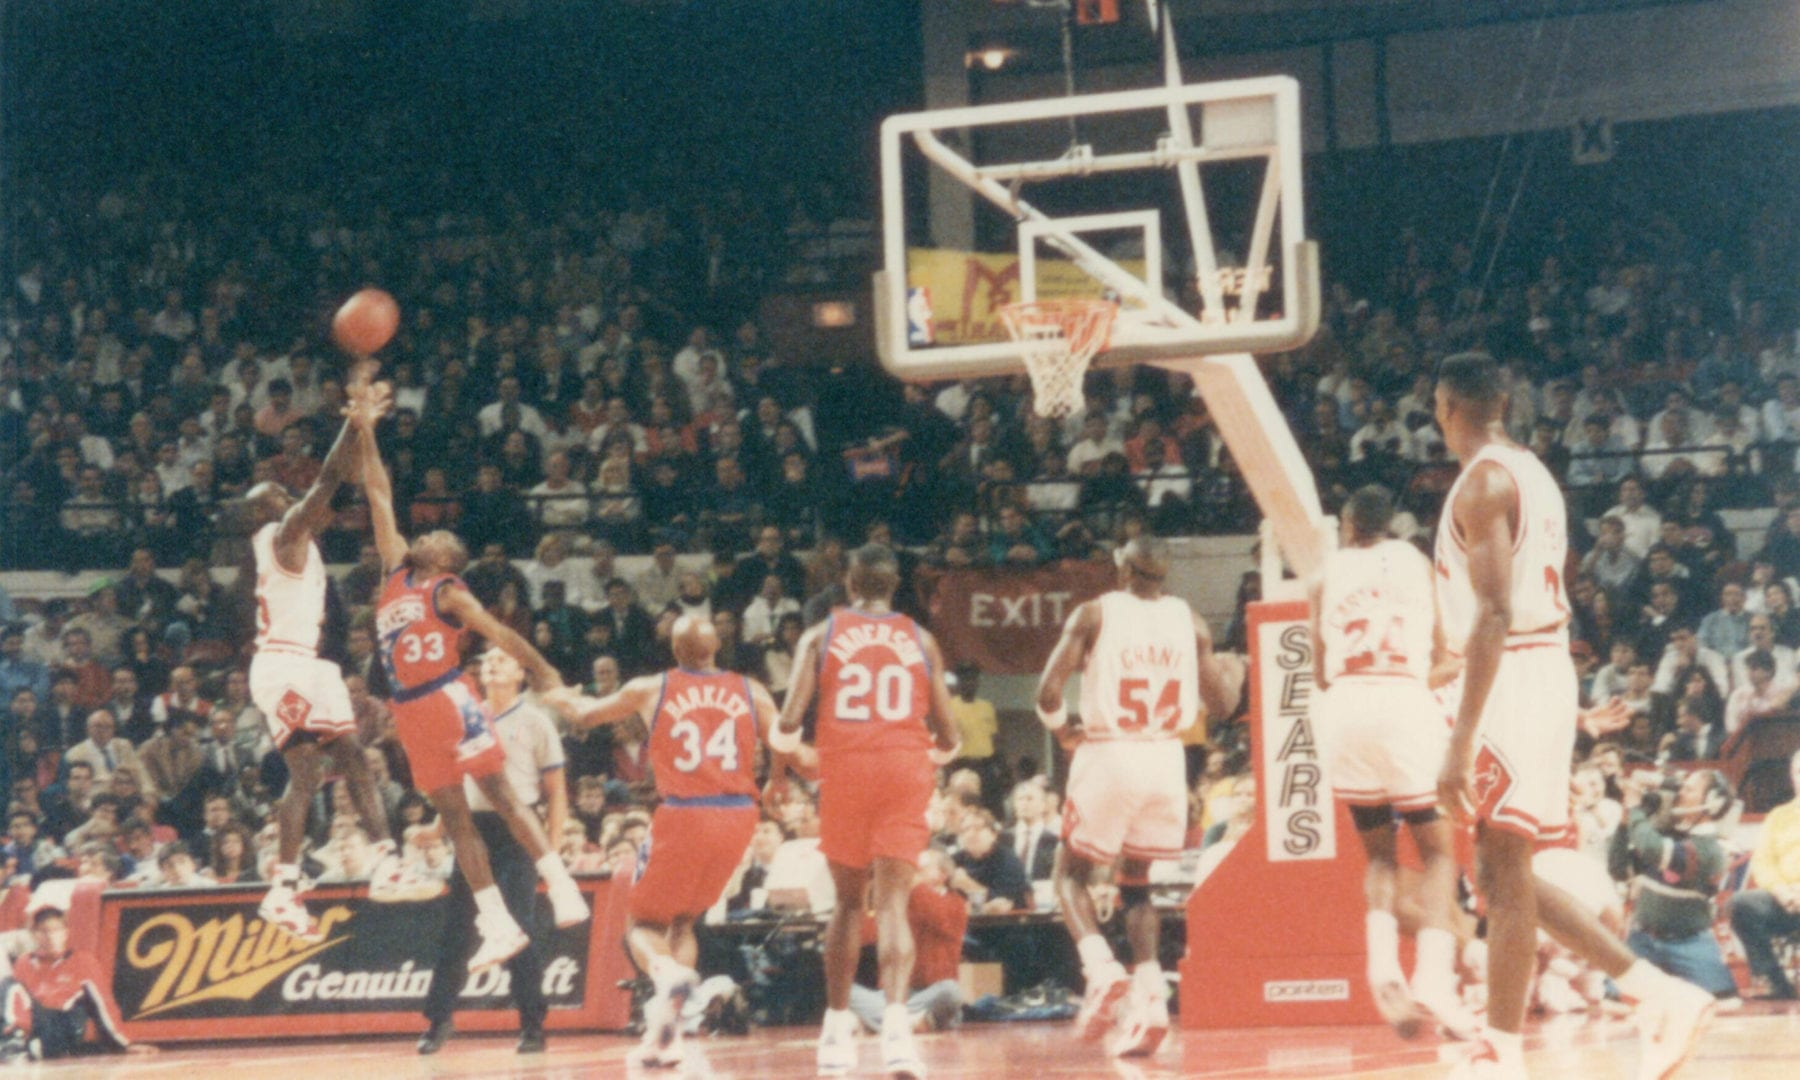 MJ doing a jump shot over Hersey Hawkins